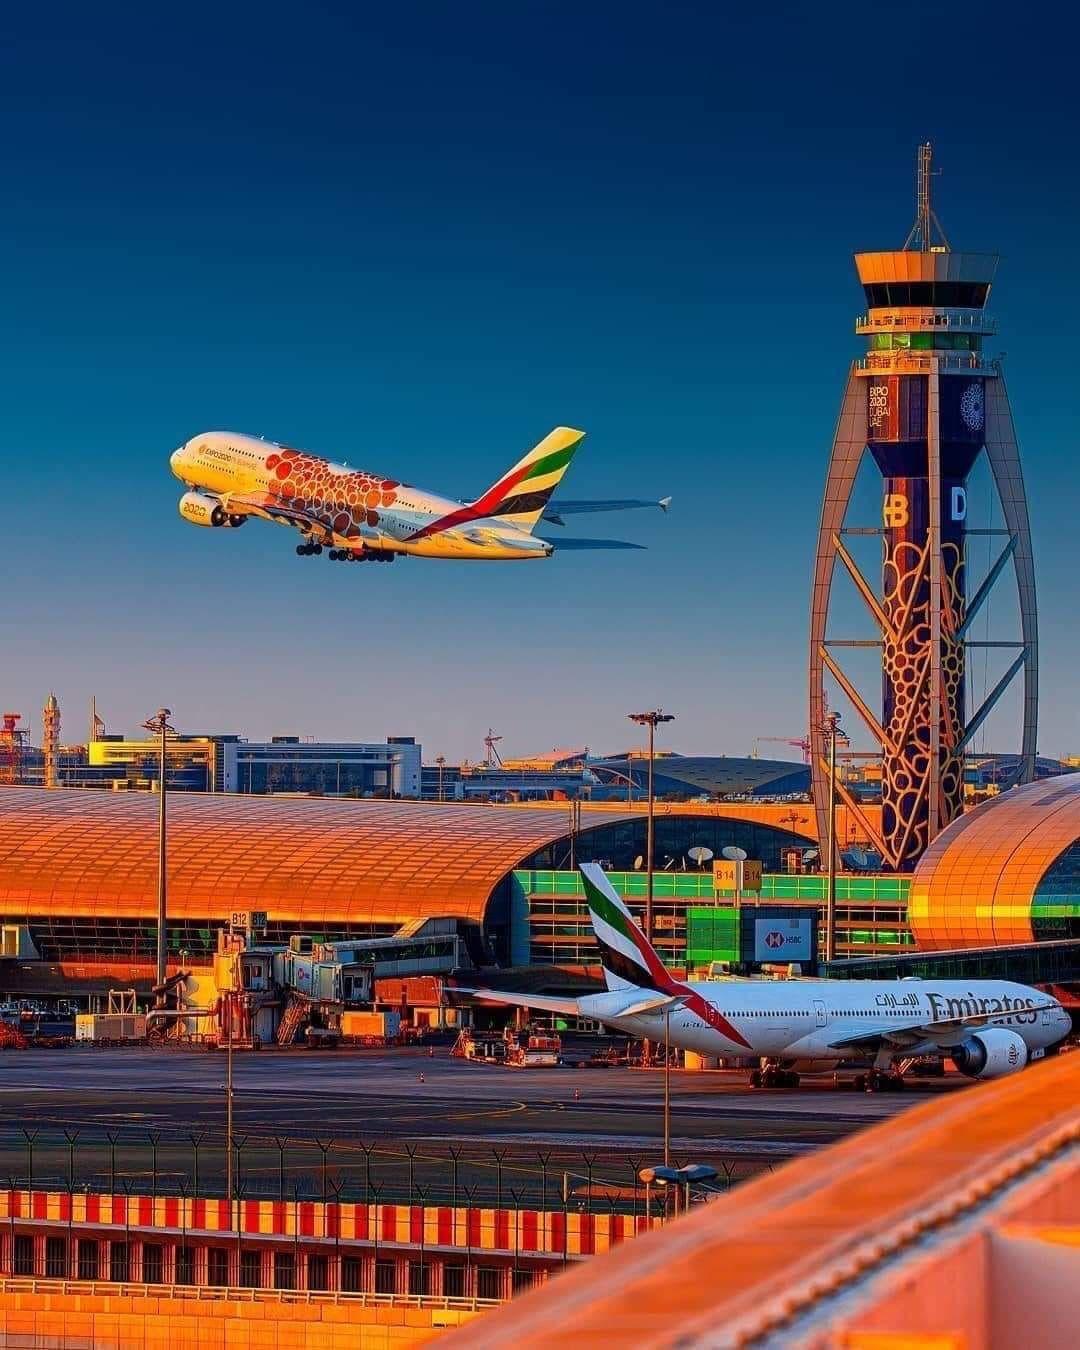 Avia image by Олег in 2020 Passenger, Aviation